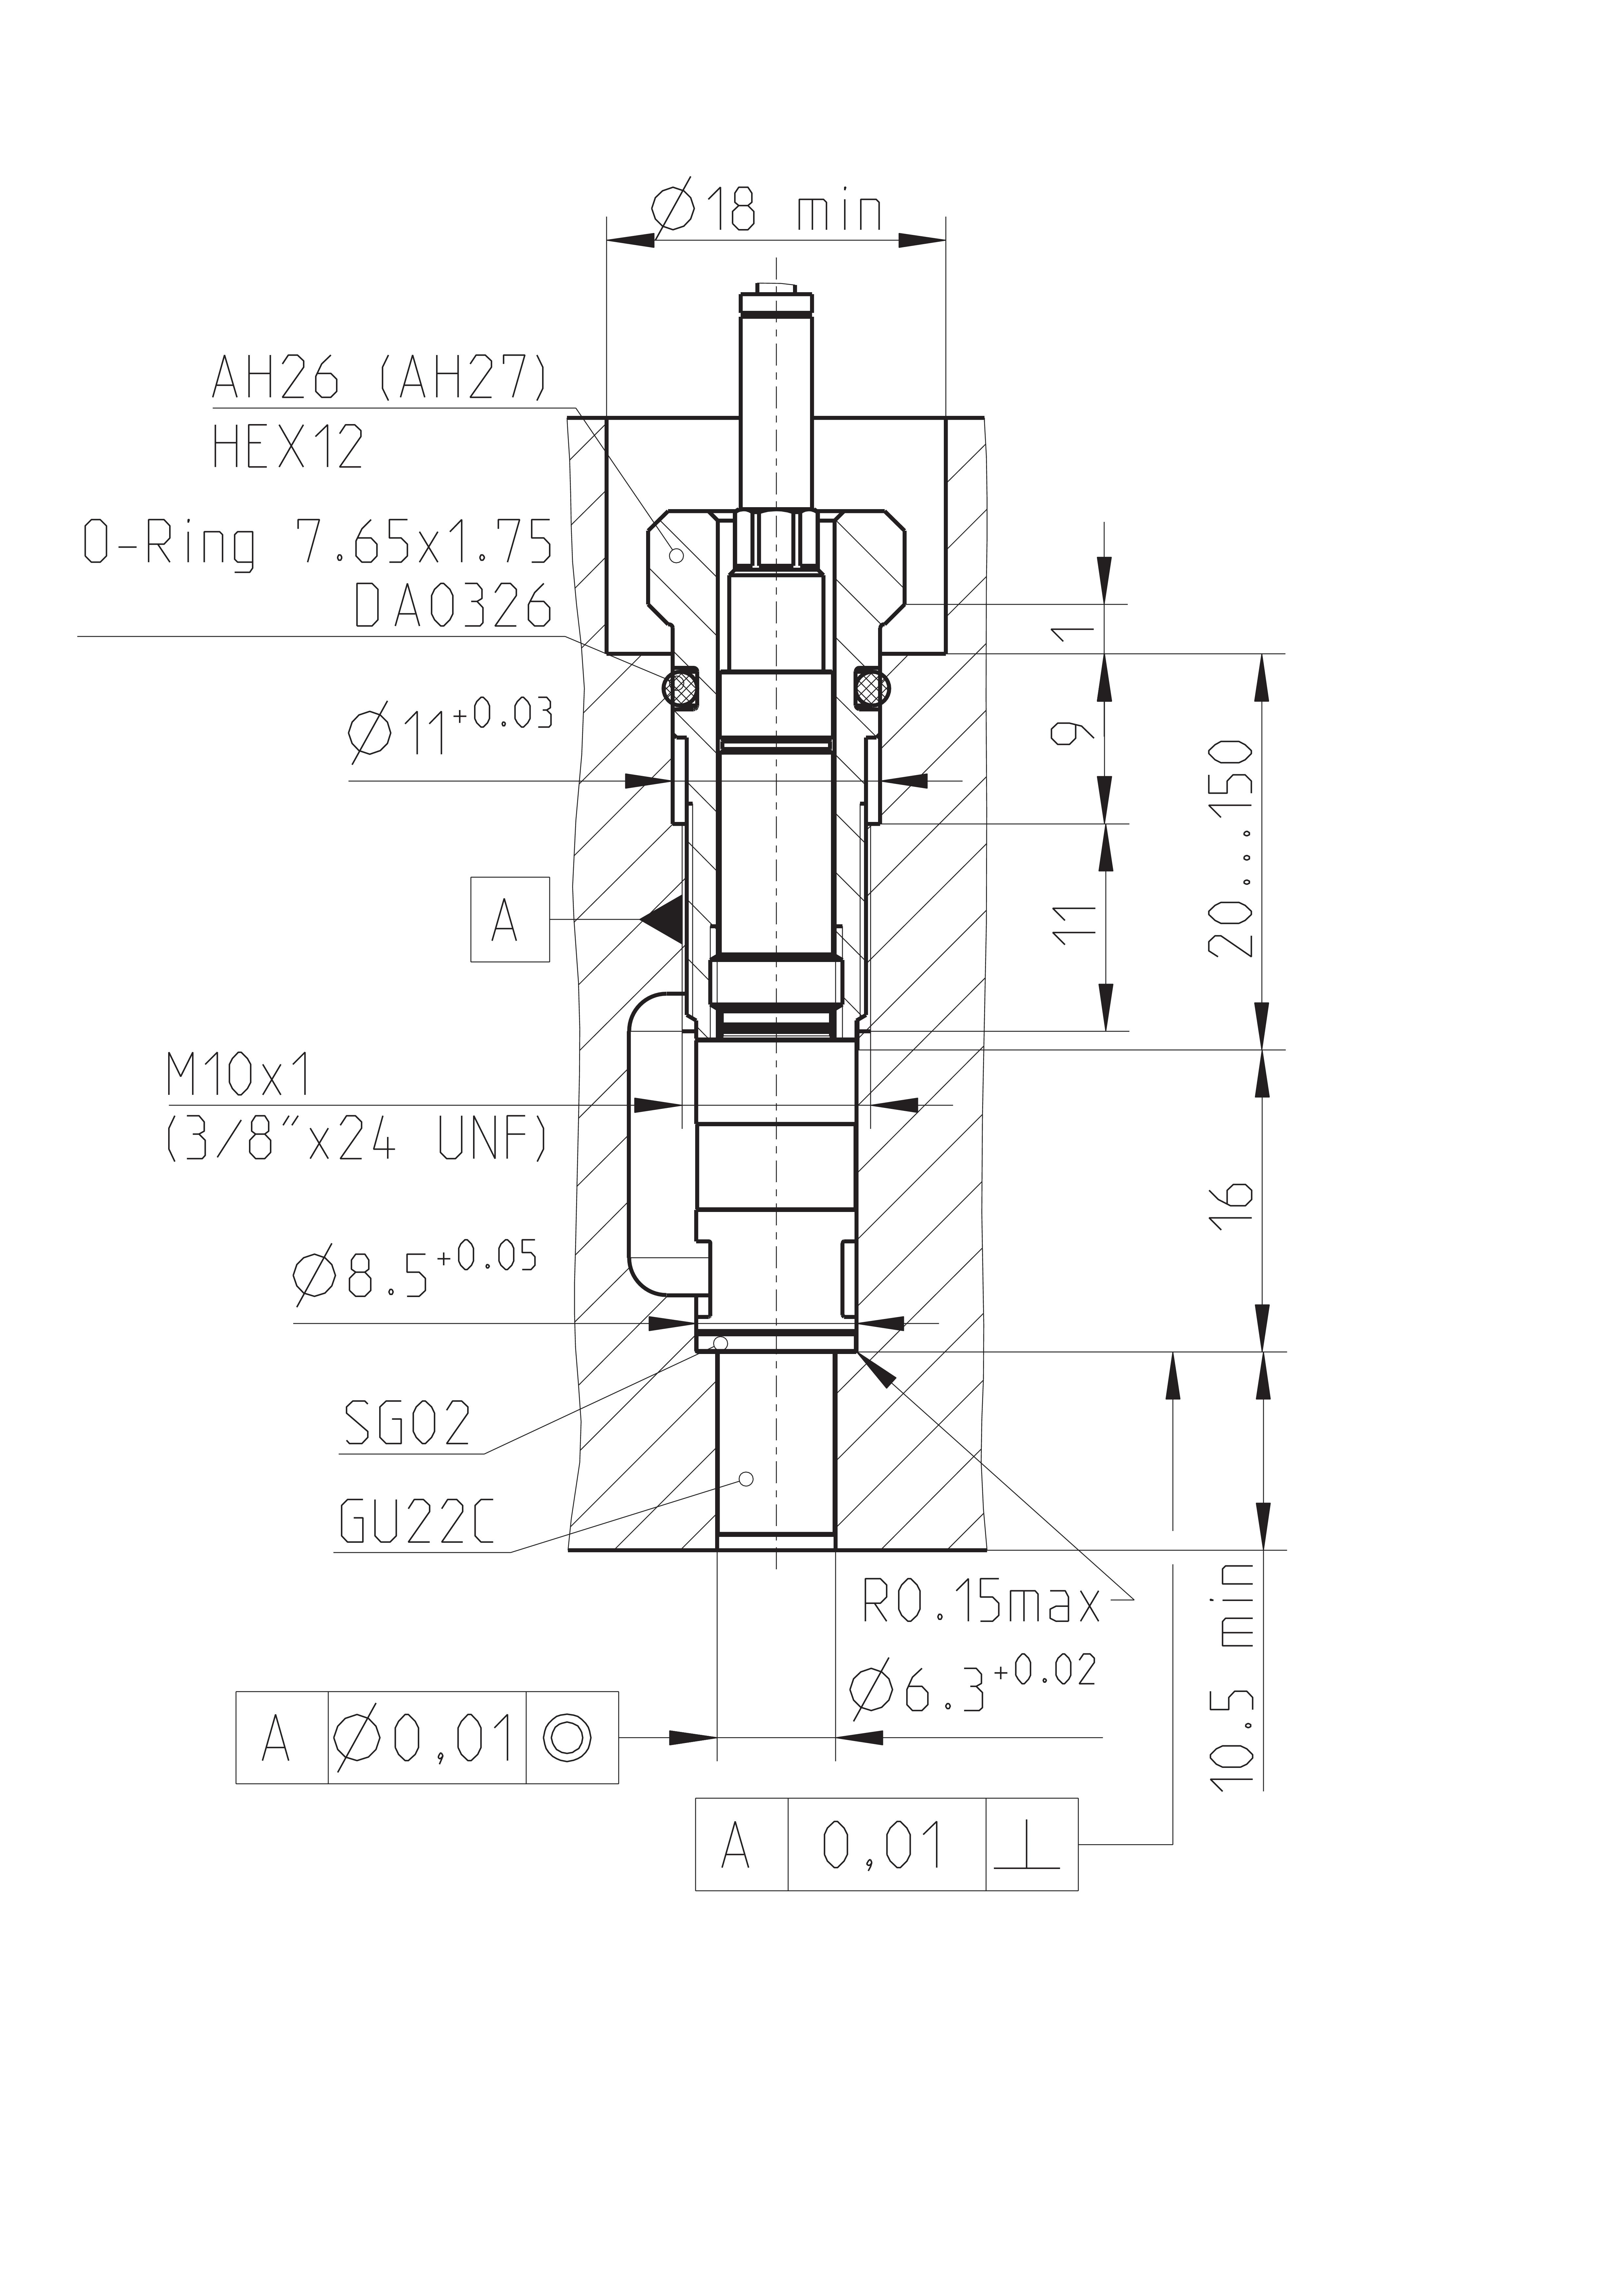 gu22c - pressure sensors for combustion analysis